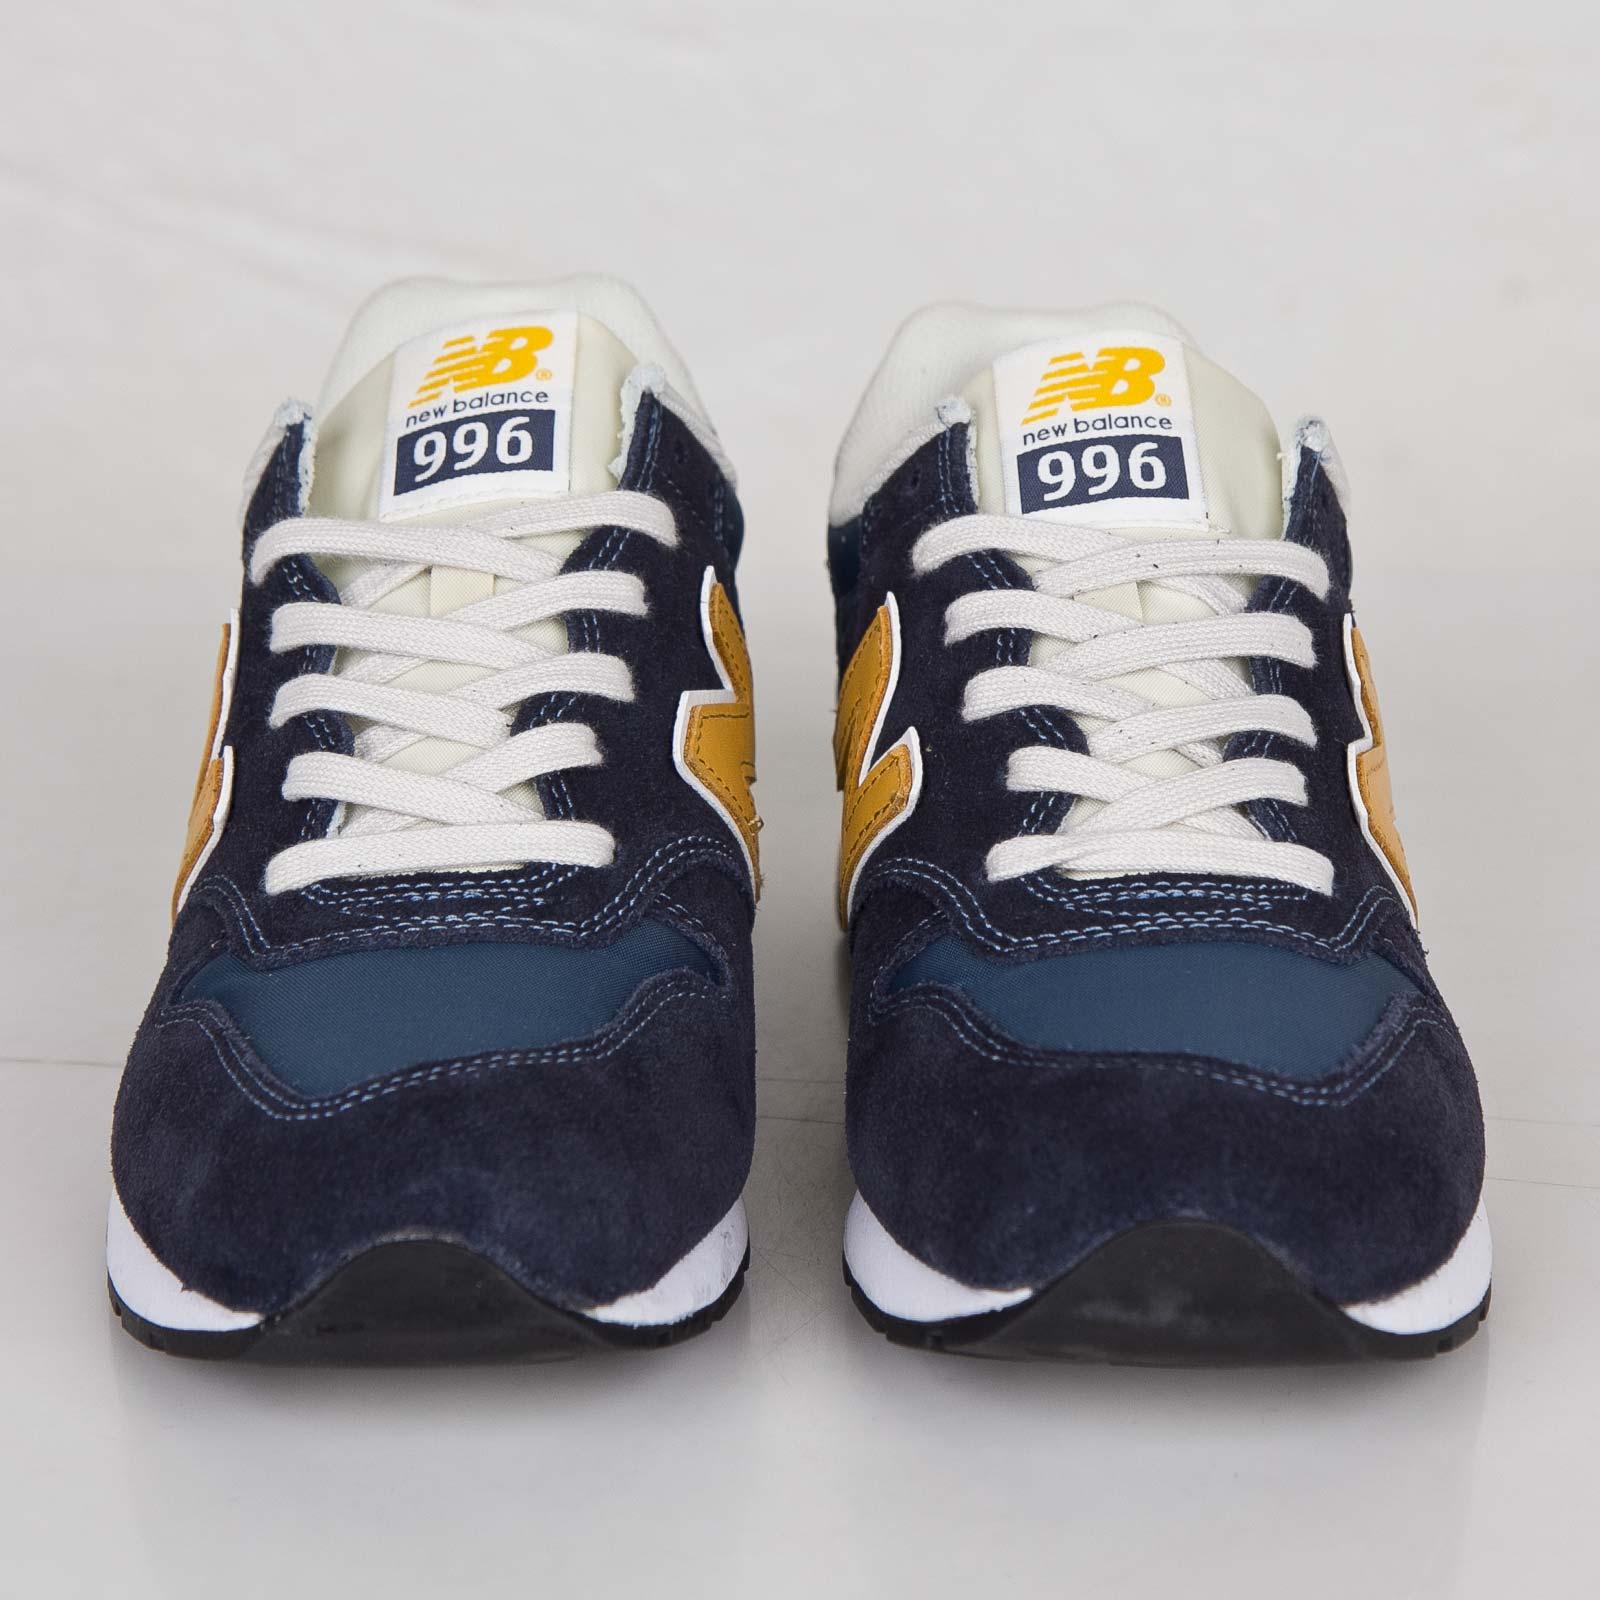 New Balance MRL996 Mrl996ff Sneakersnstuff I Sneakers